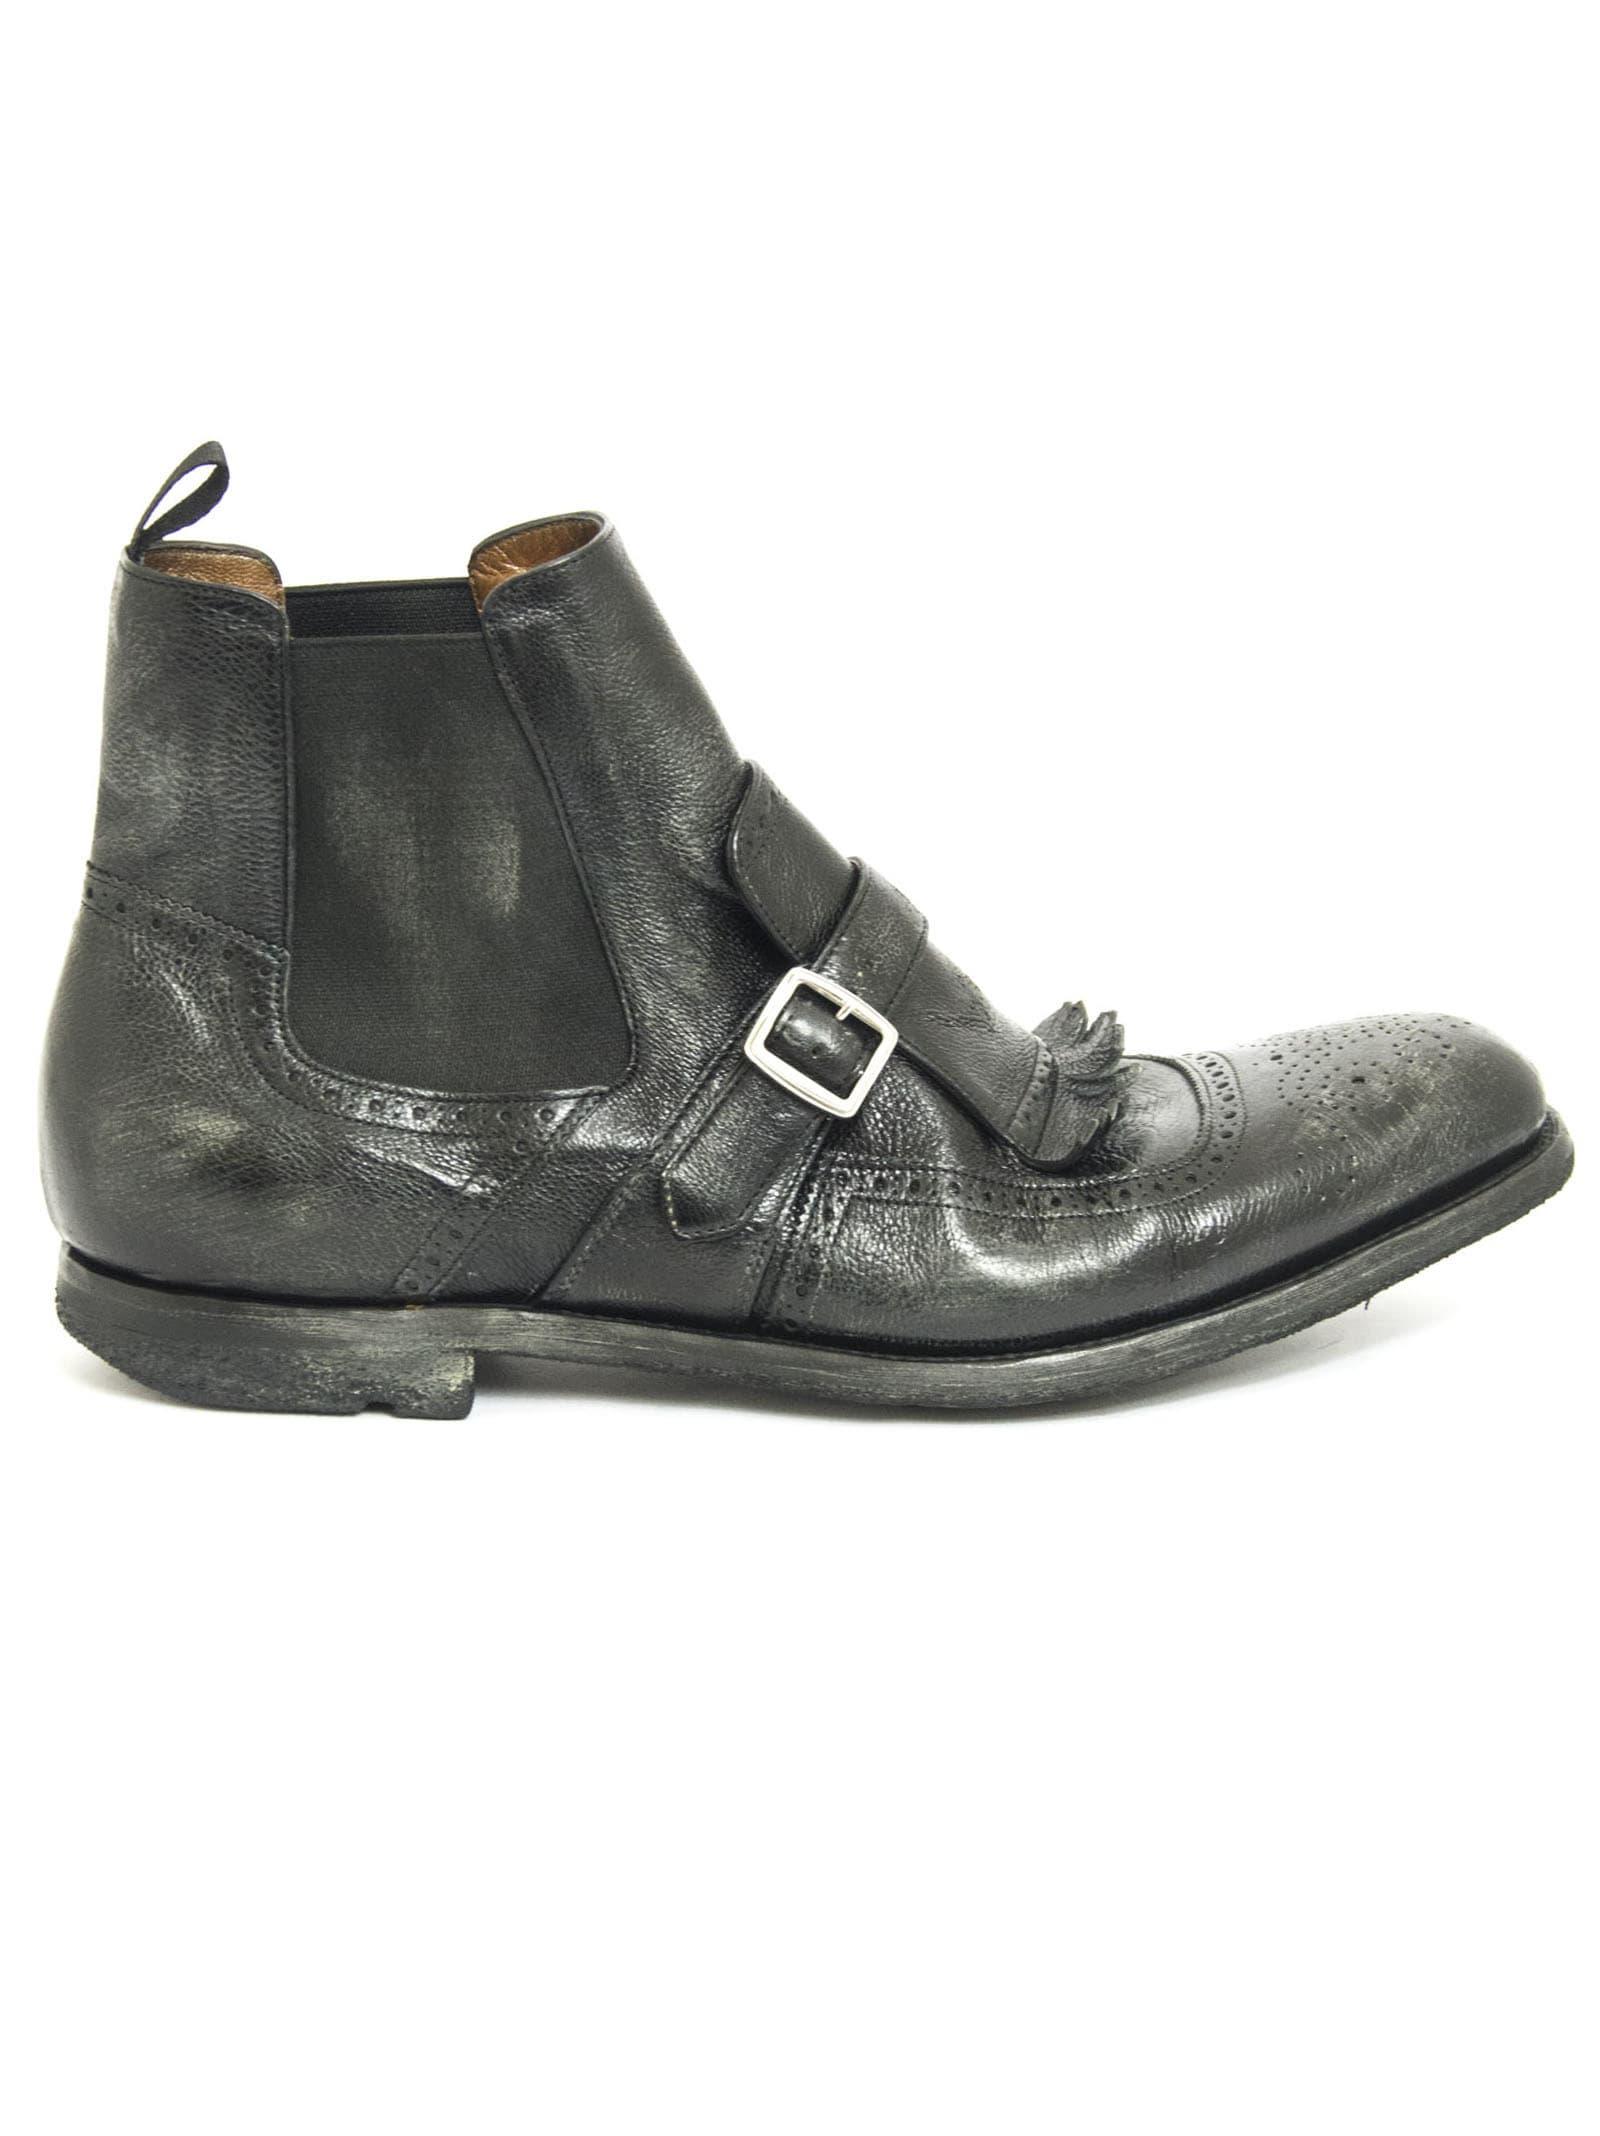 Churchs Shanghai Vintage Leather Chelsea Boot Black